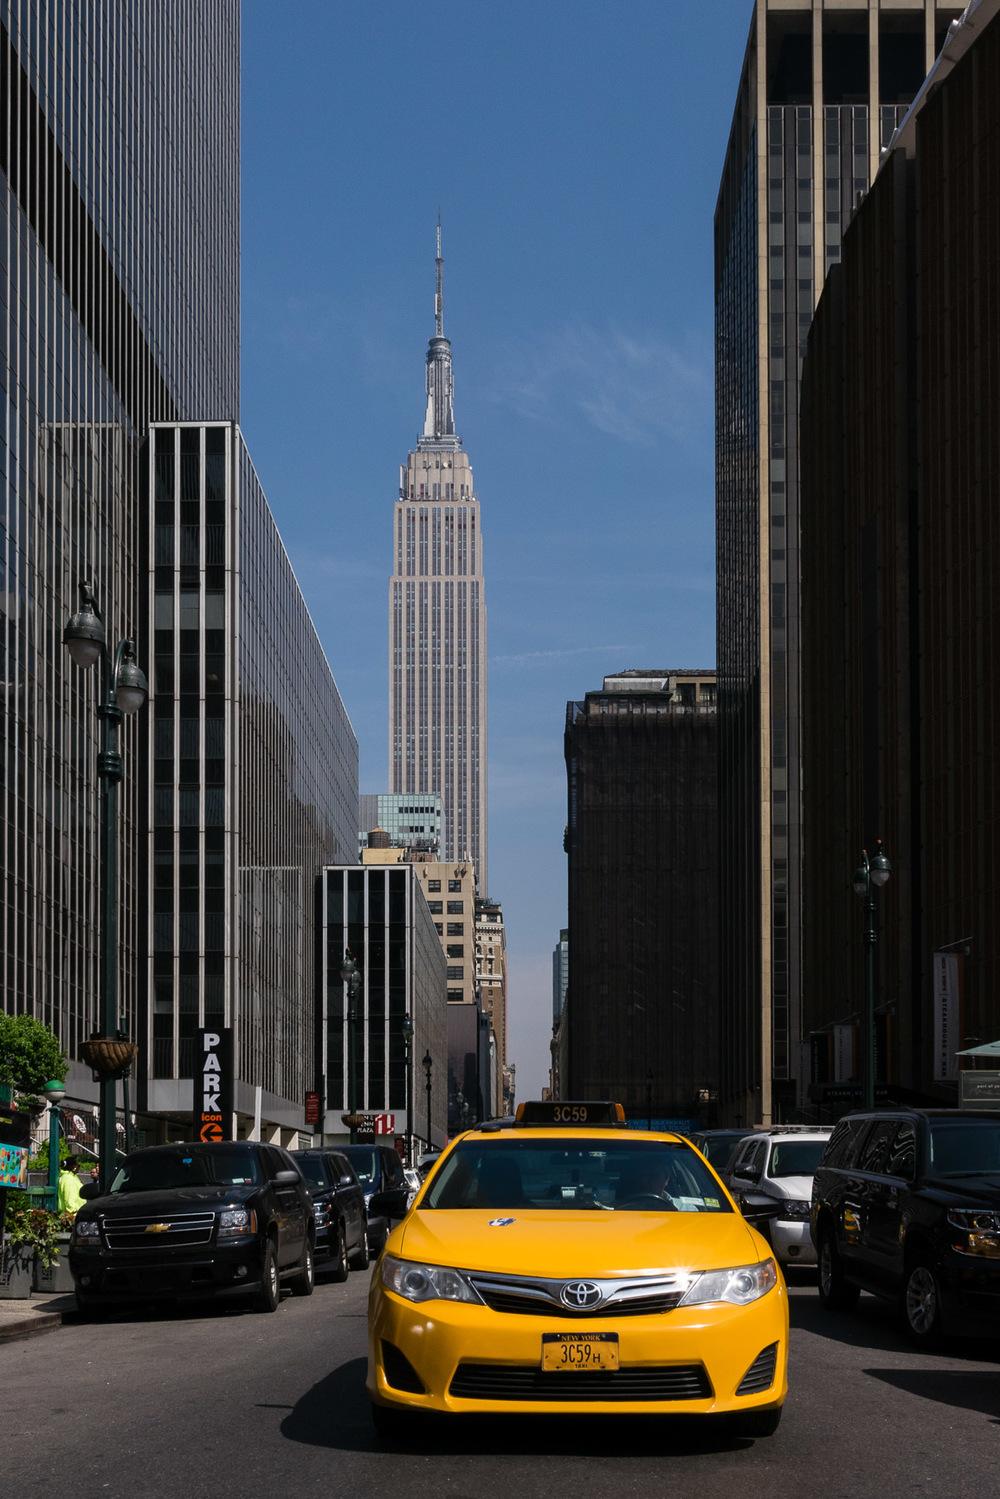 2015-05-14-NYC-1931.jpg